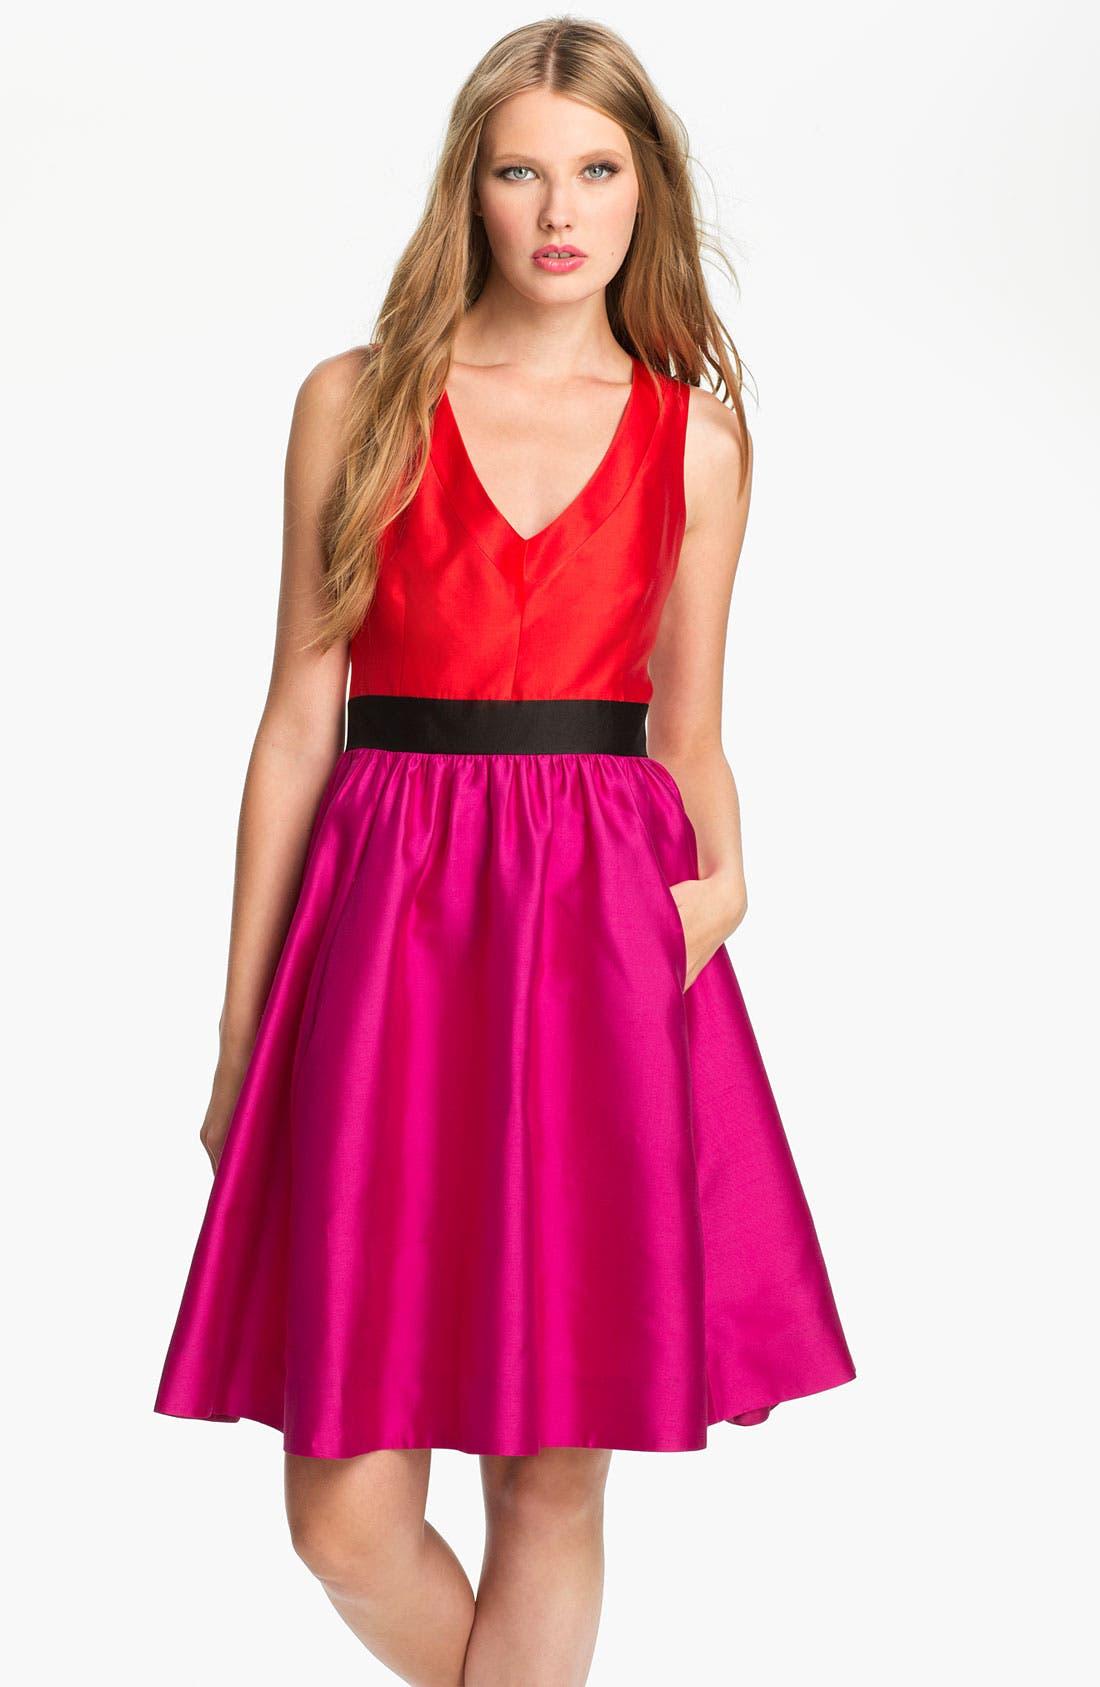 Alternate Image 1 Selected - kate spade new york 'normandy' silk blend fit & flare dress